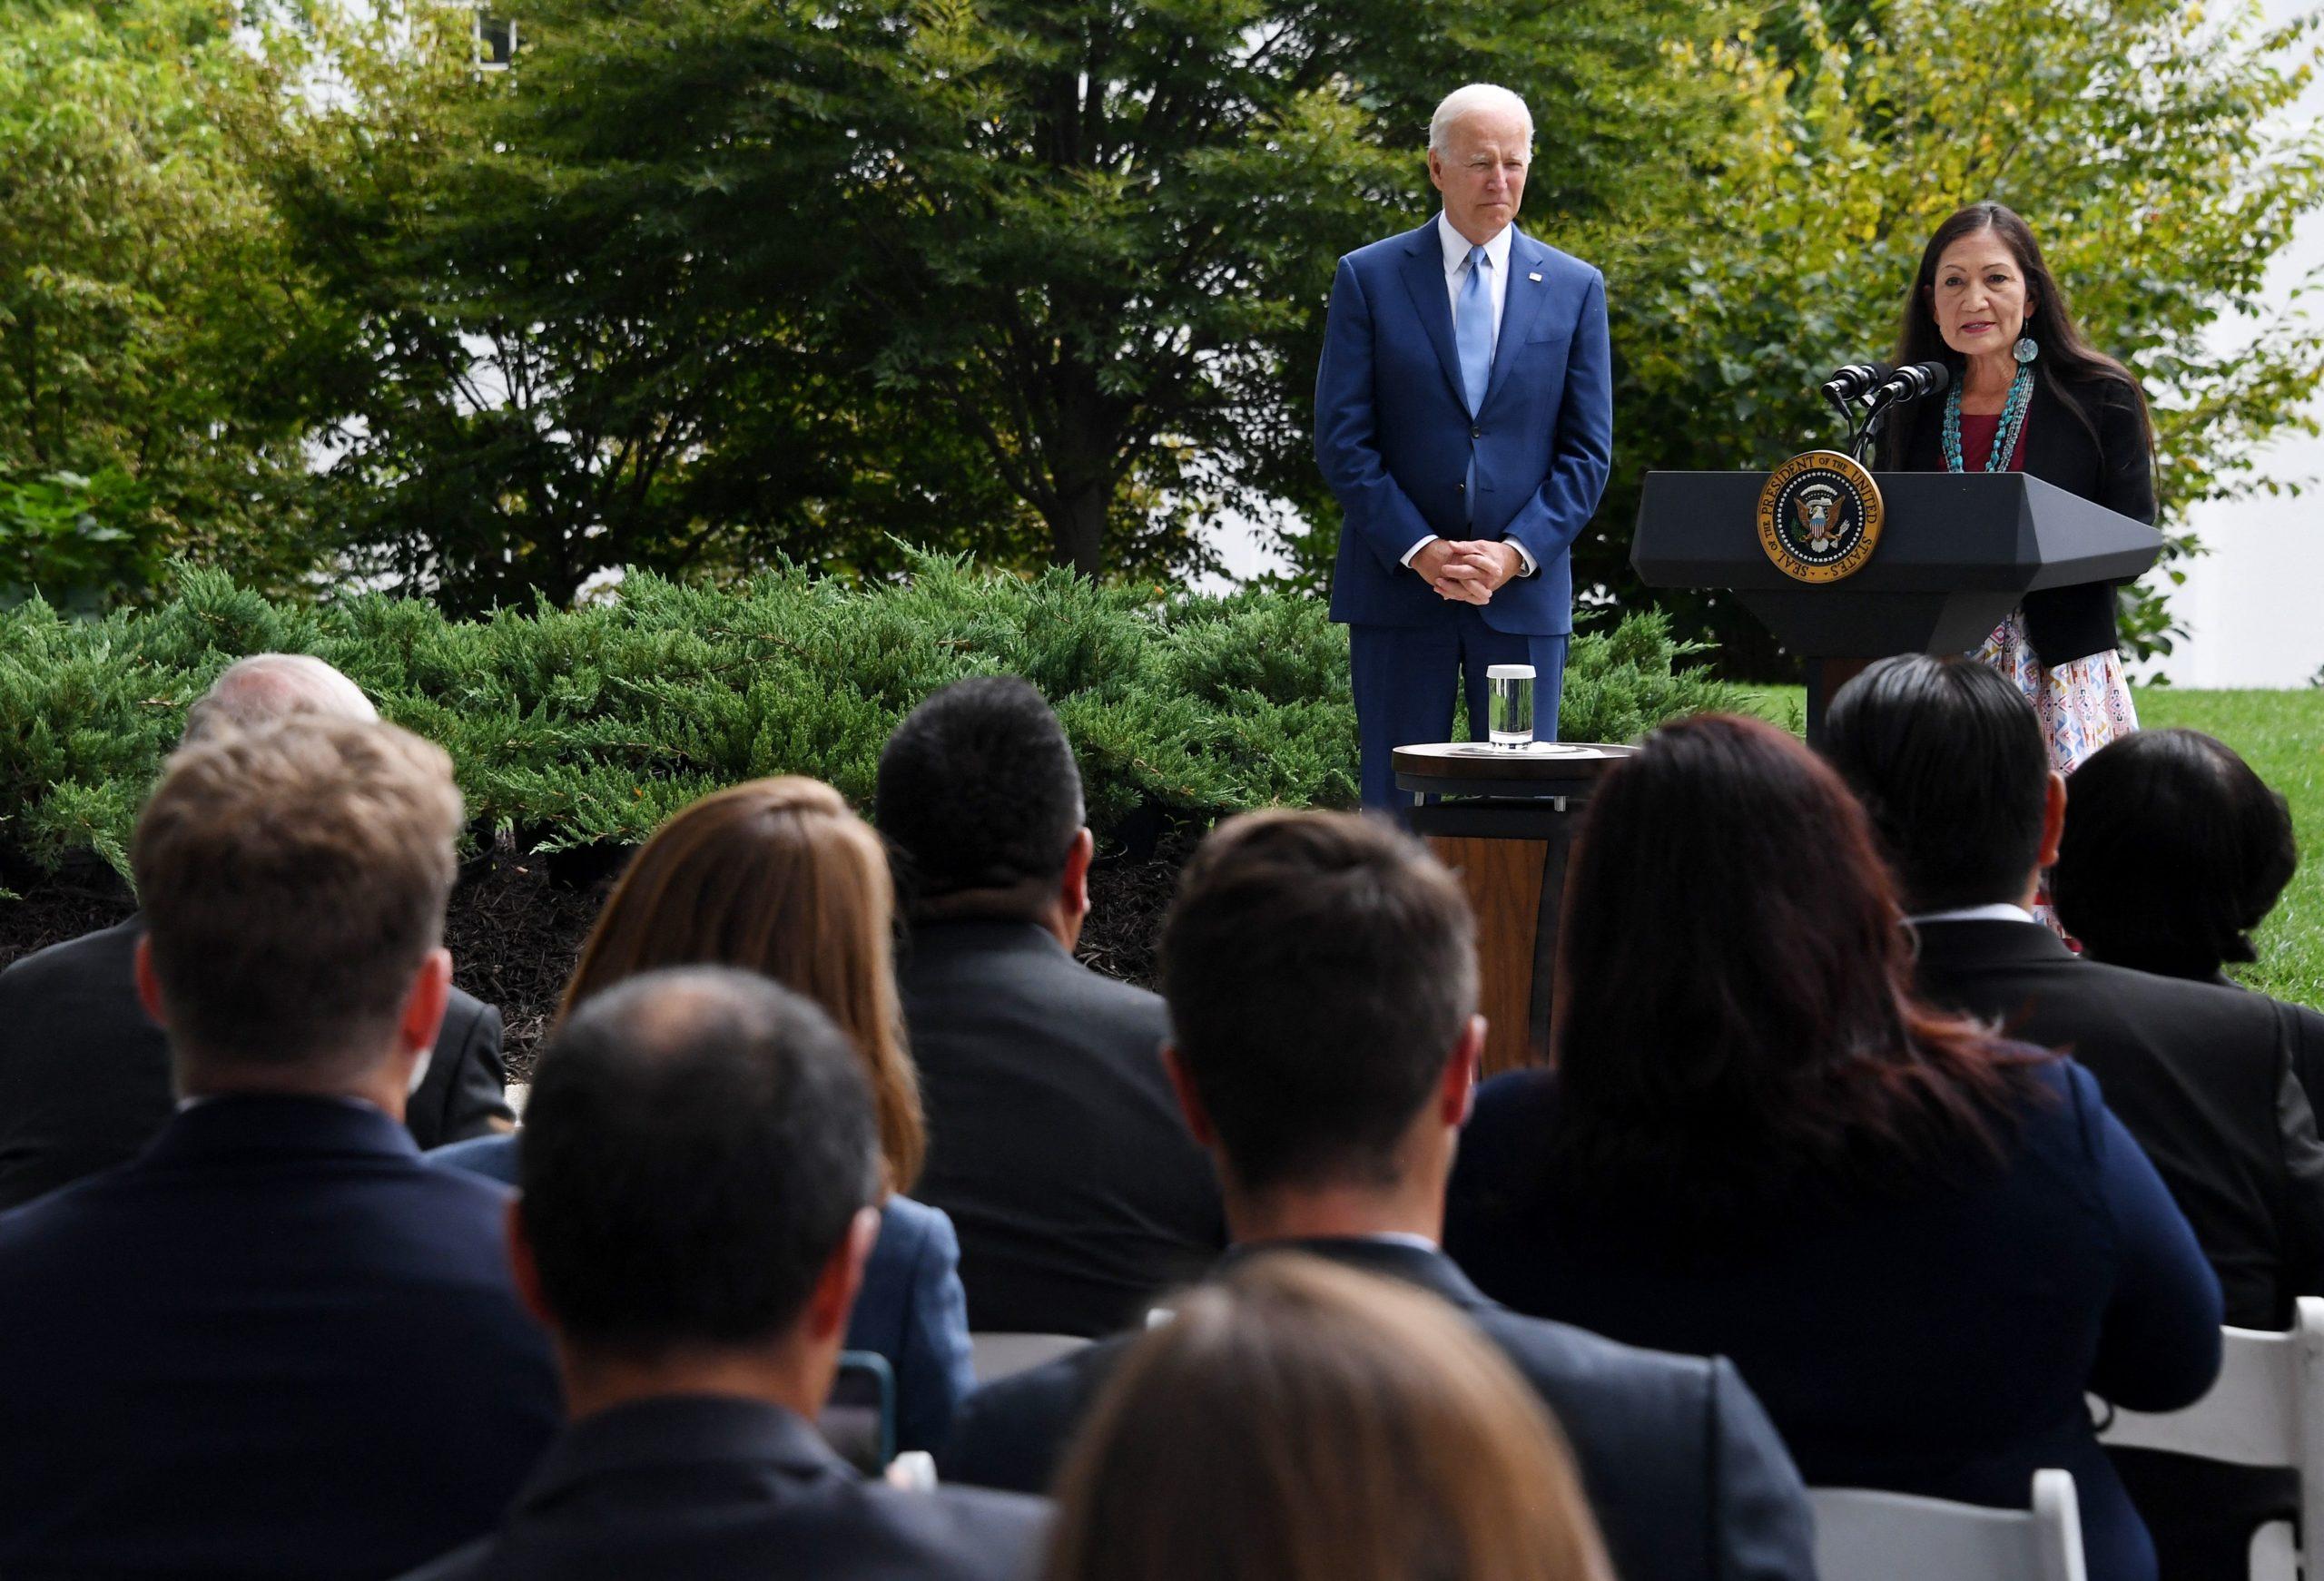 President Joe Biden listens to Interior Secretary Deb Haaland speak during a ceremony on Oct. 8. (Olivier Douliery/AFP via Getty Images)